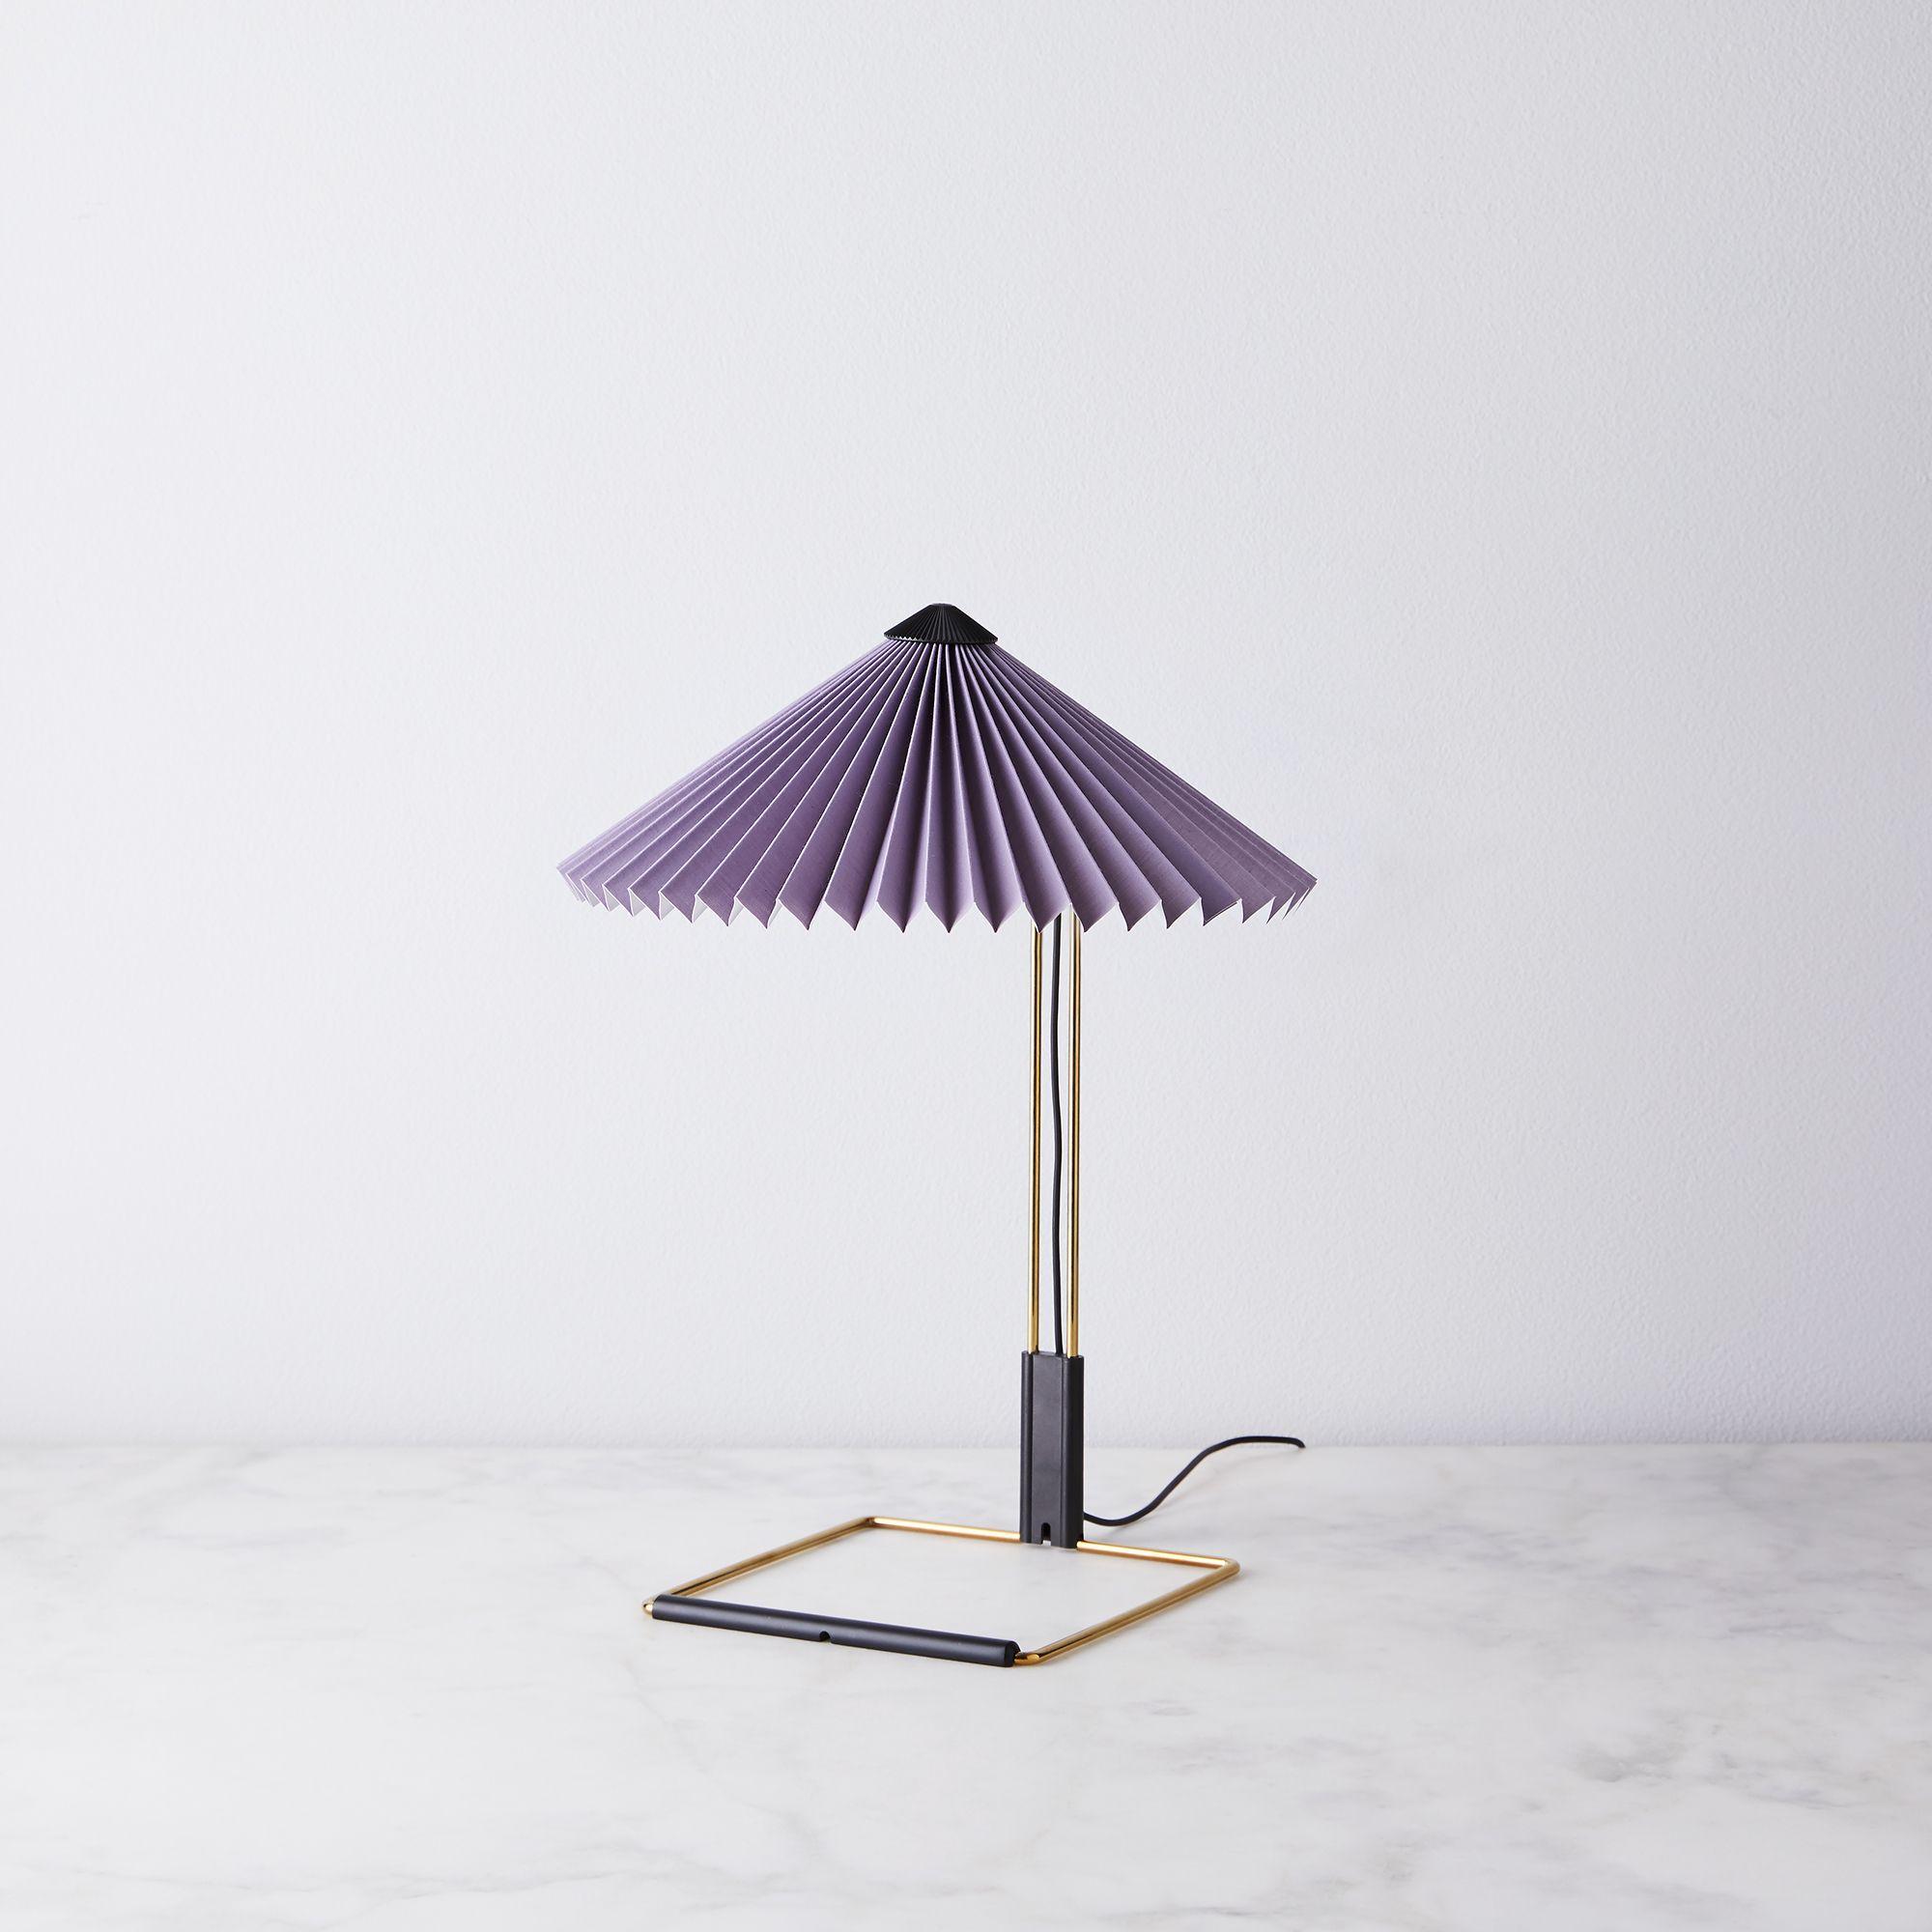 table lamp by Susan Hawkins